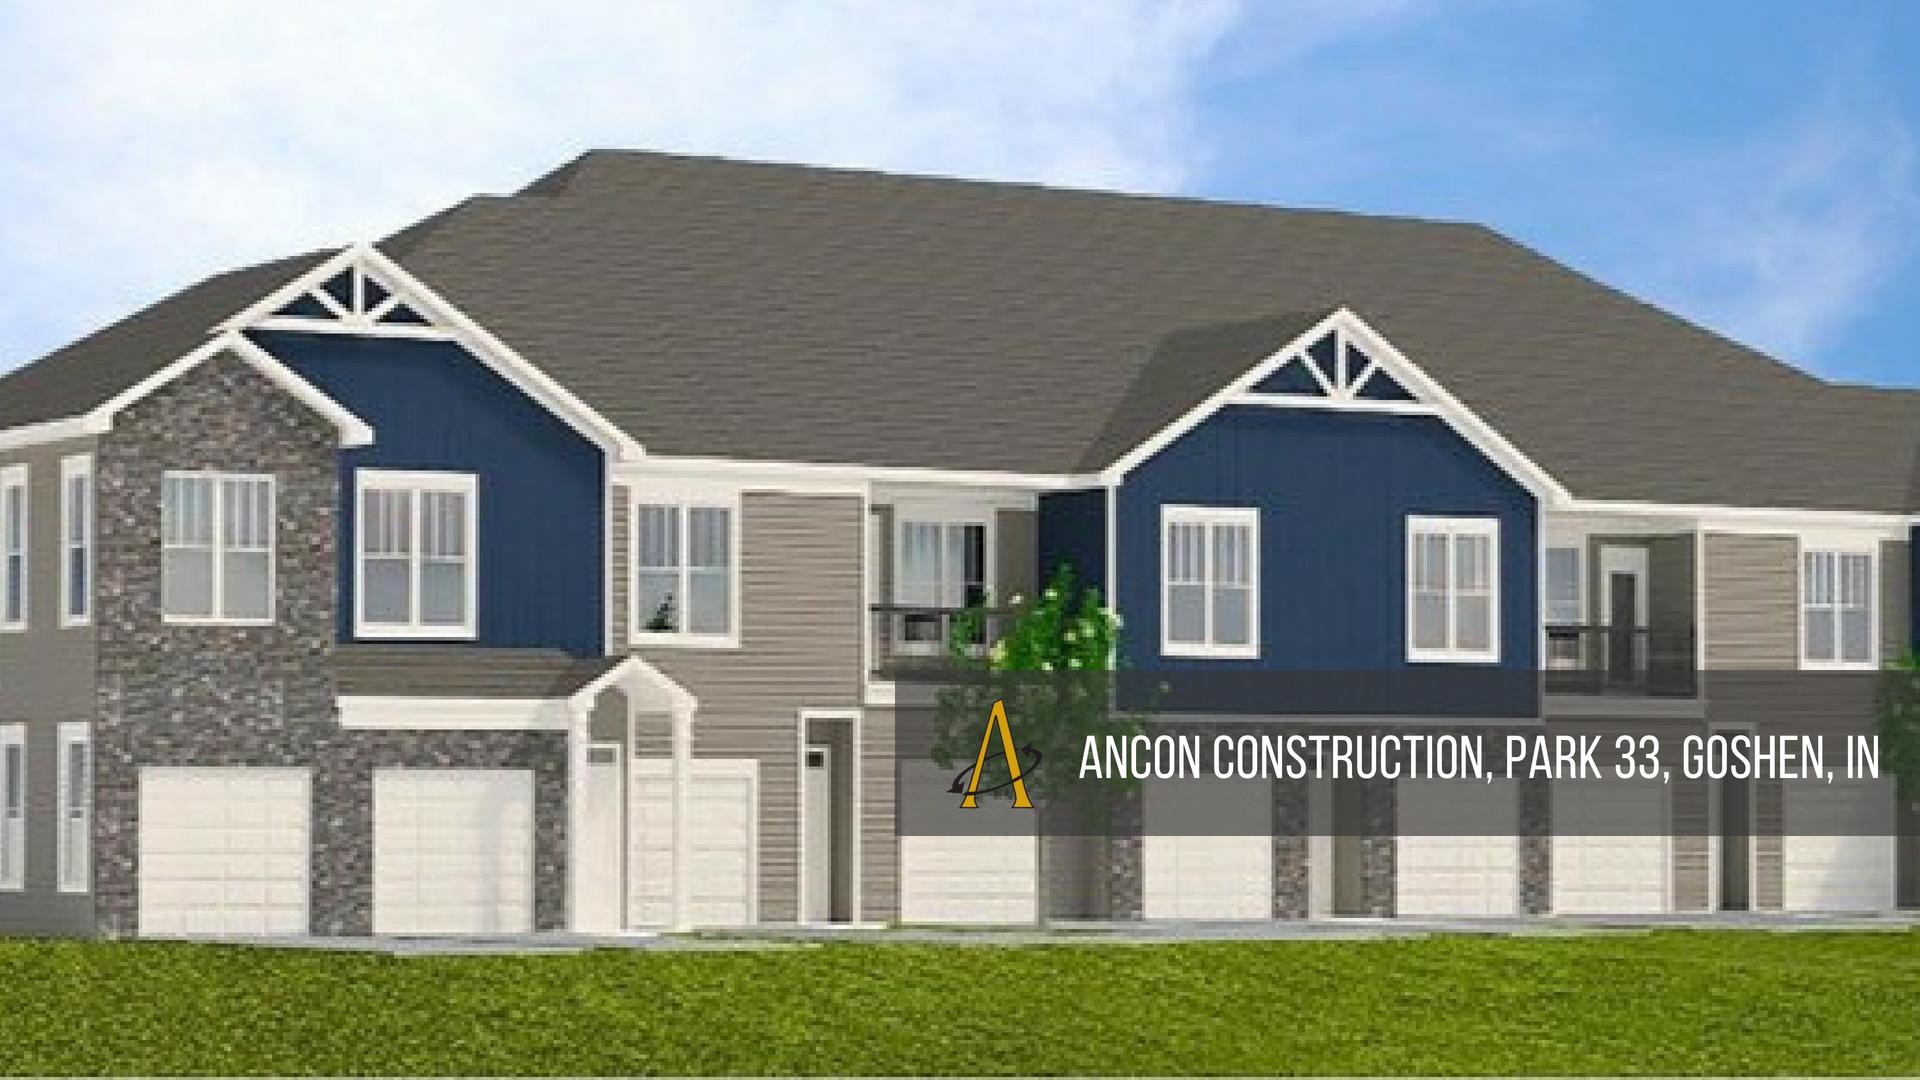 Ancon Construction, Park 33, Goshen, Indiana